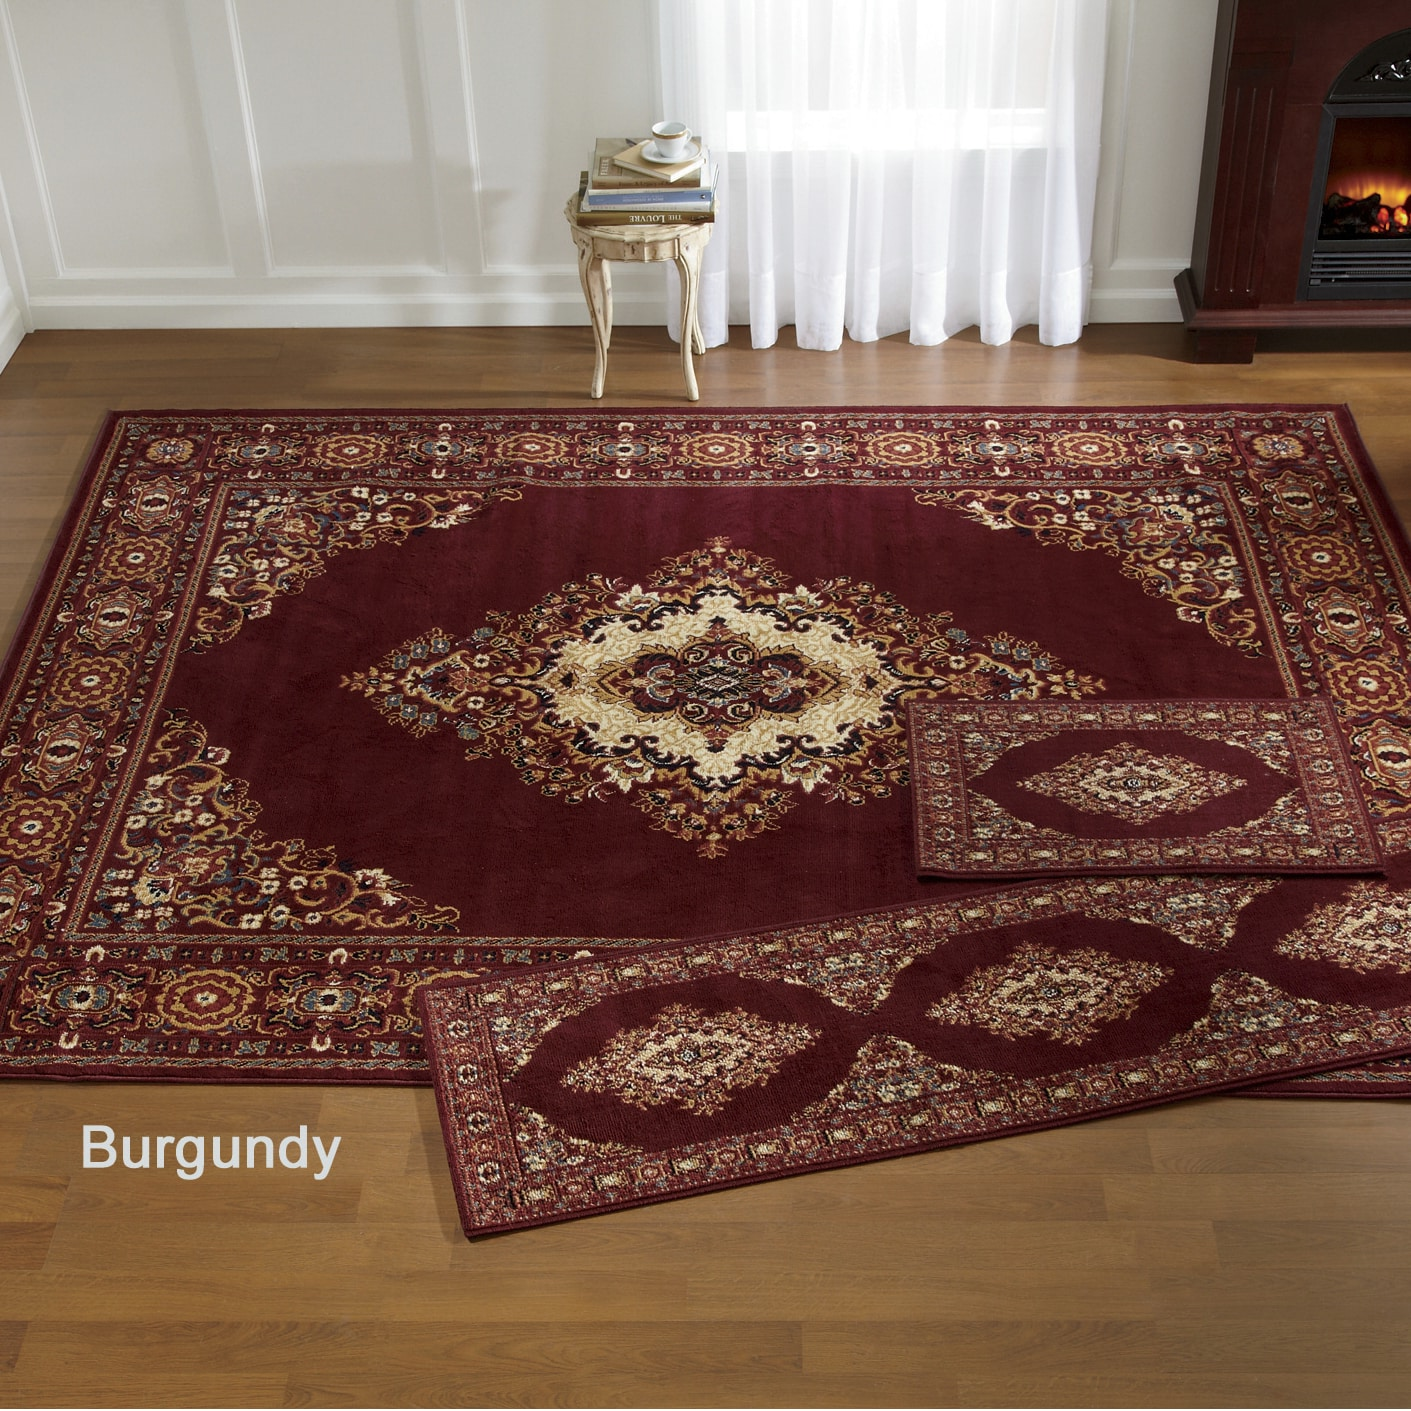 3 piece galiana rug set